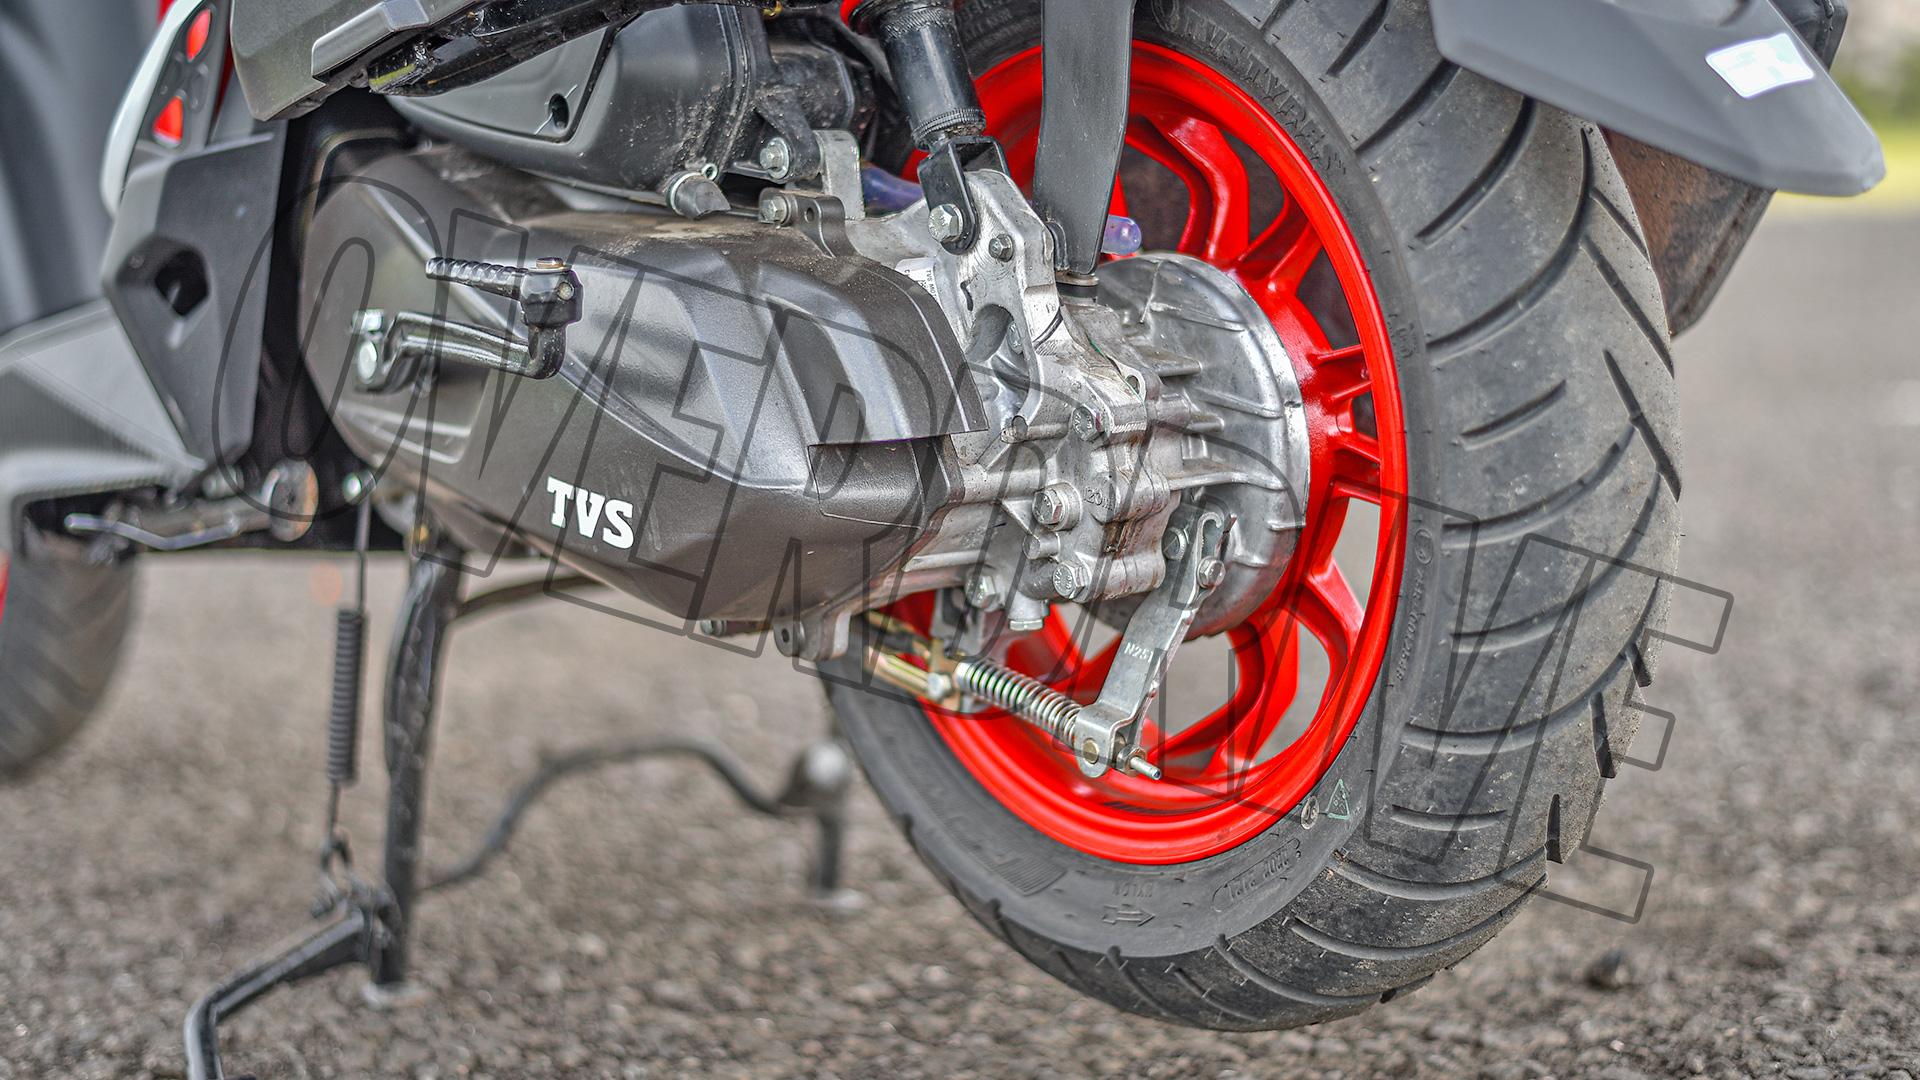 TVS Ntorq 125 2021 Race XP